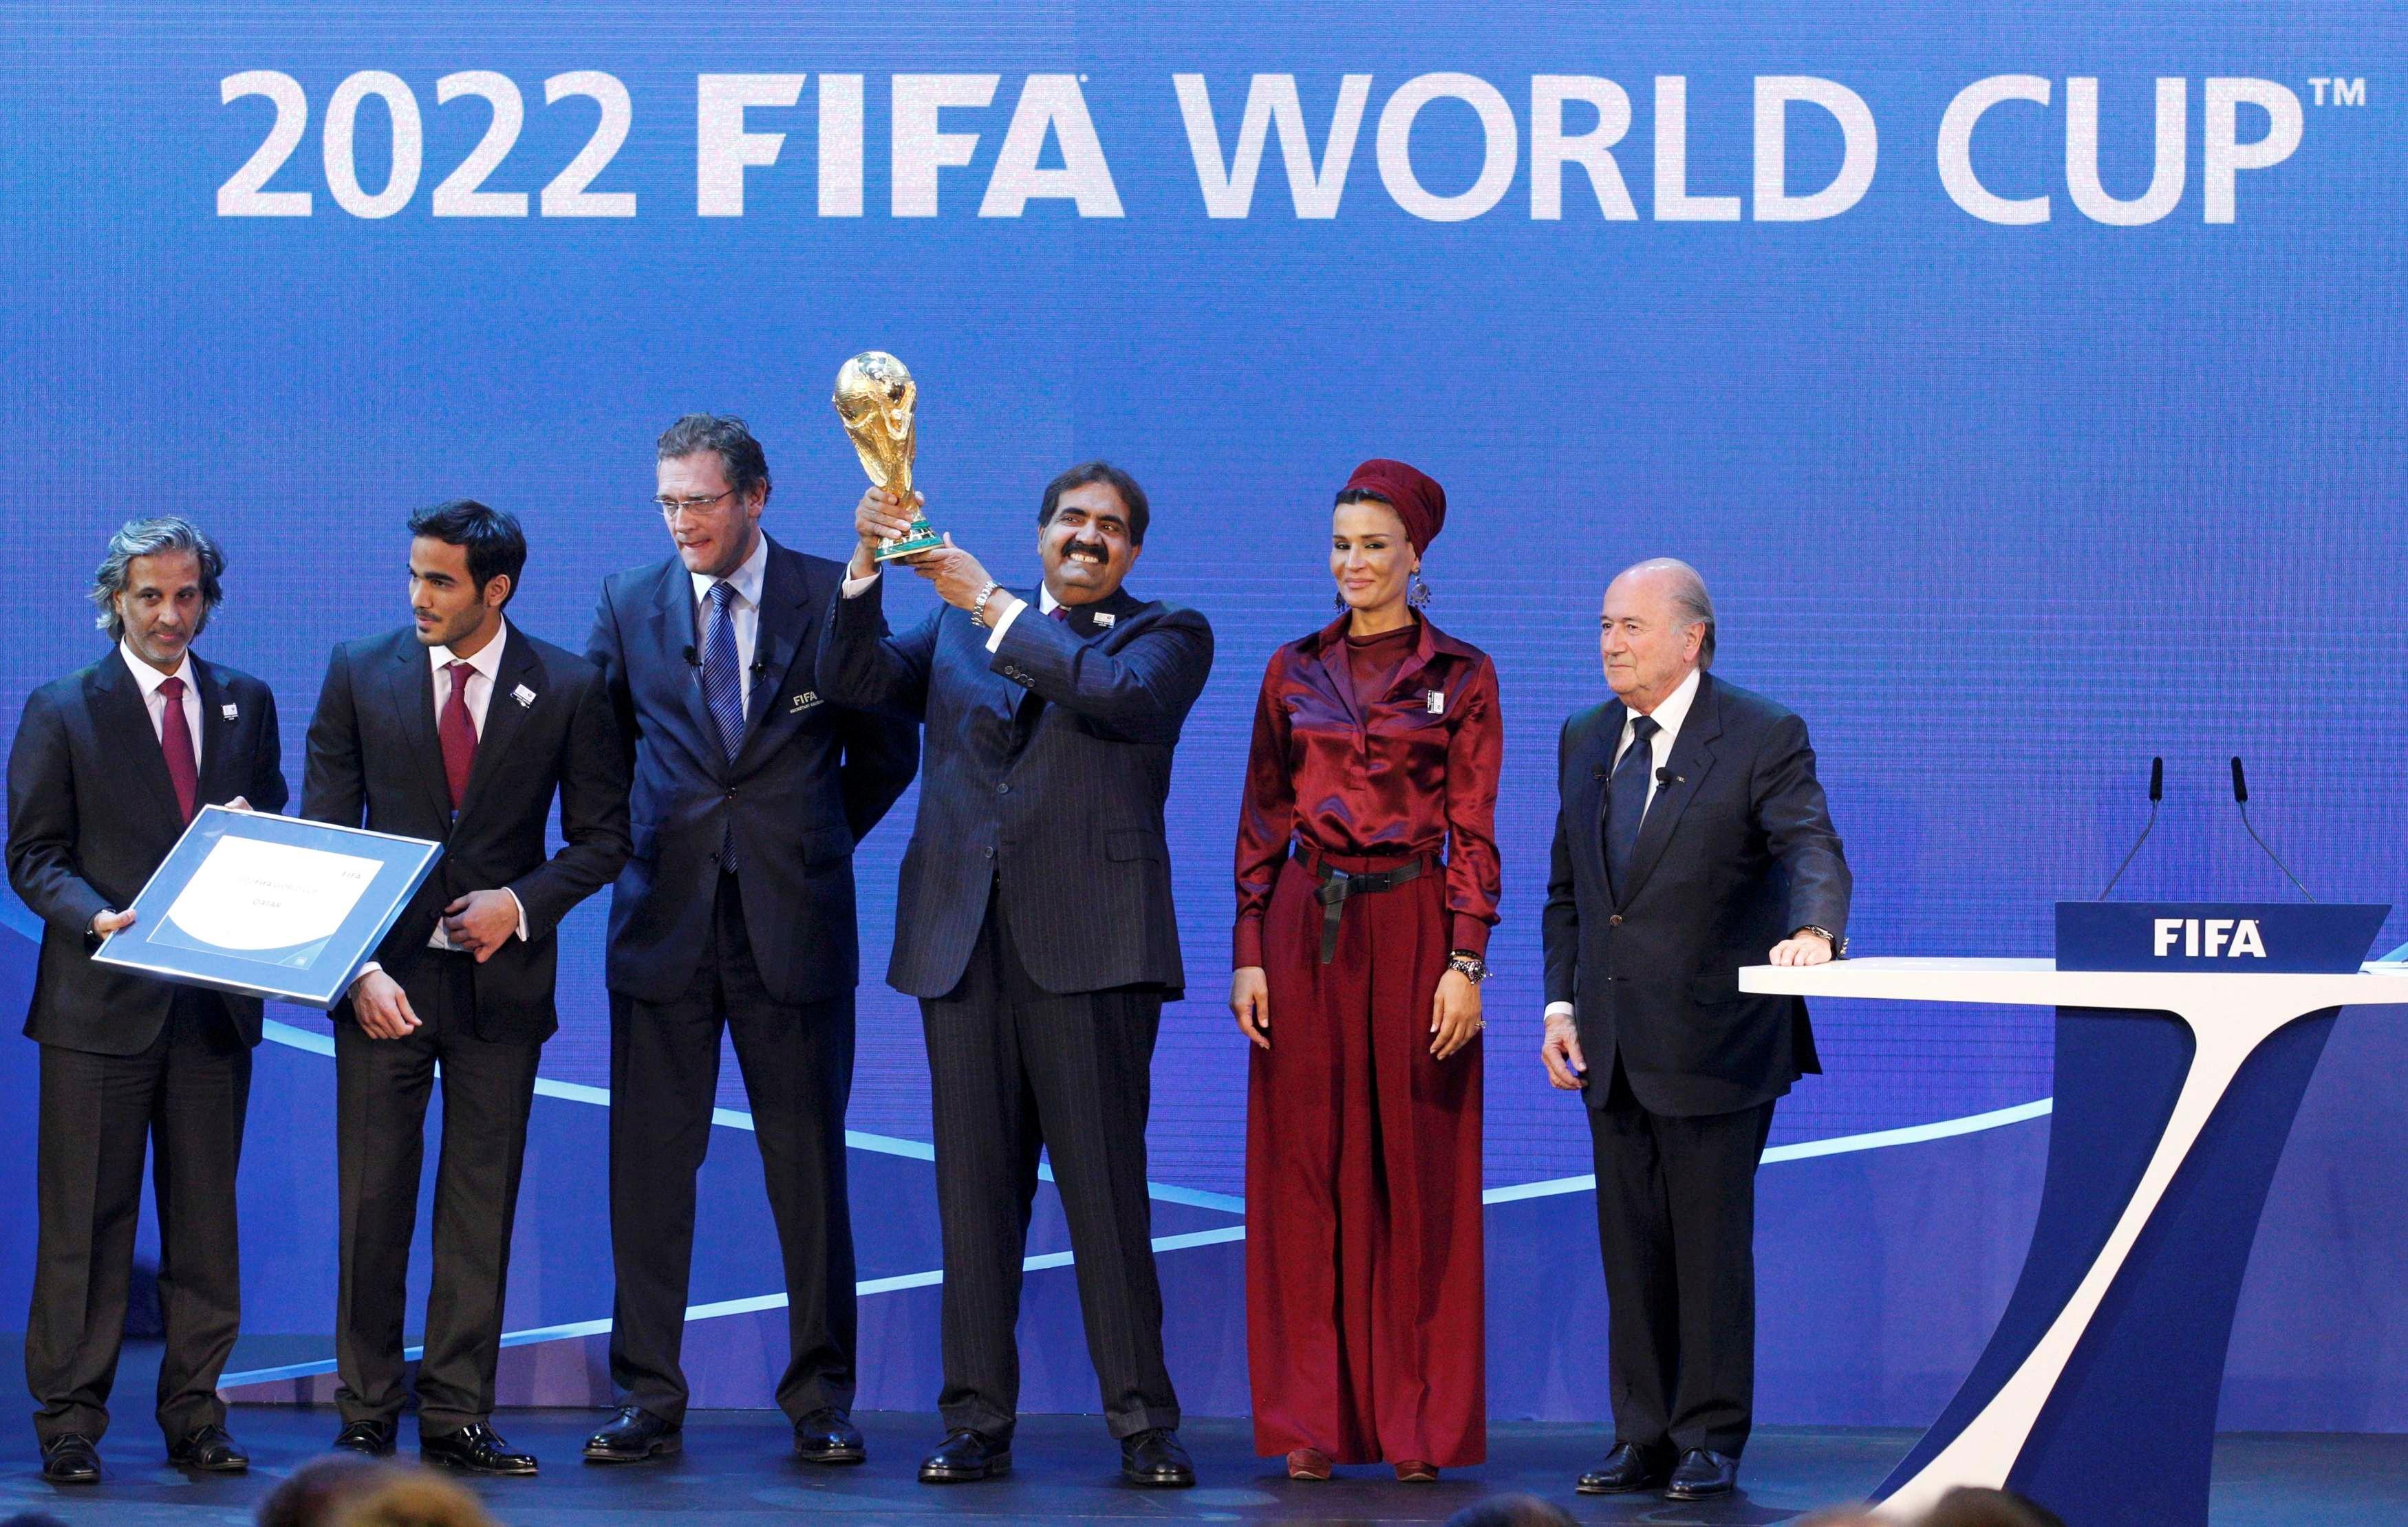 https://i.eurosport.com/2010/12/02/666792.jpg